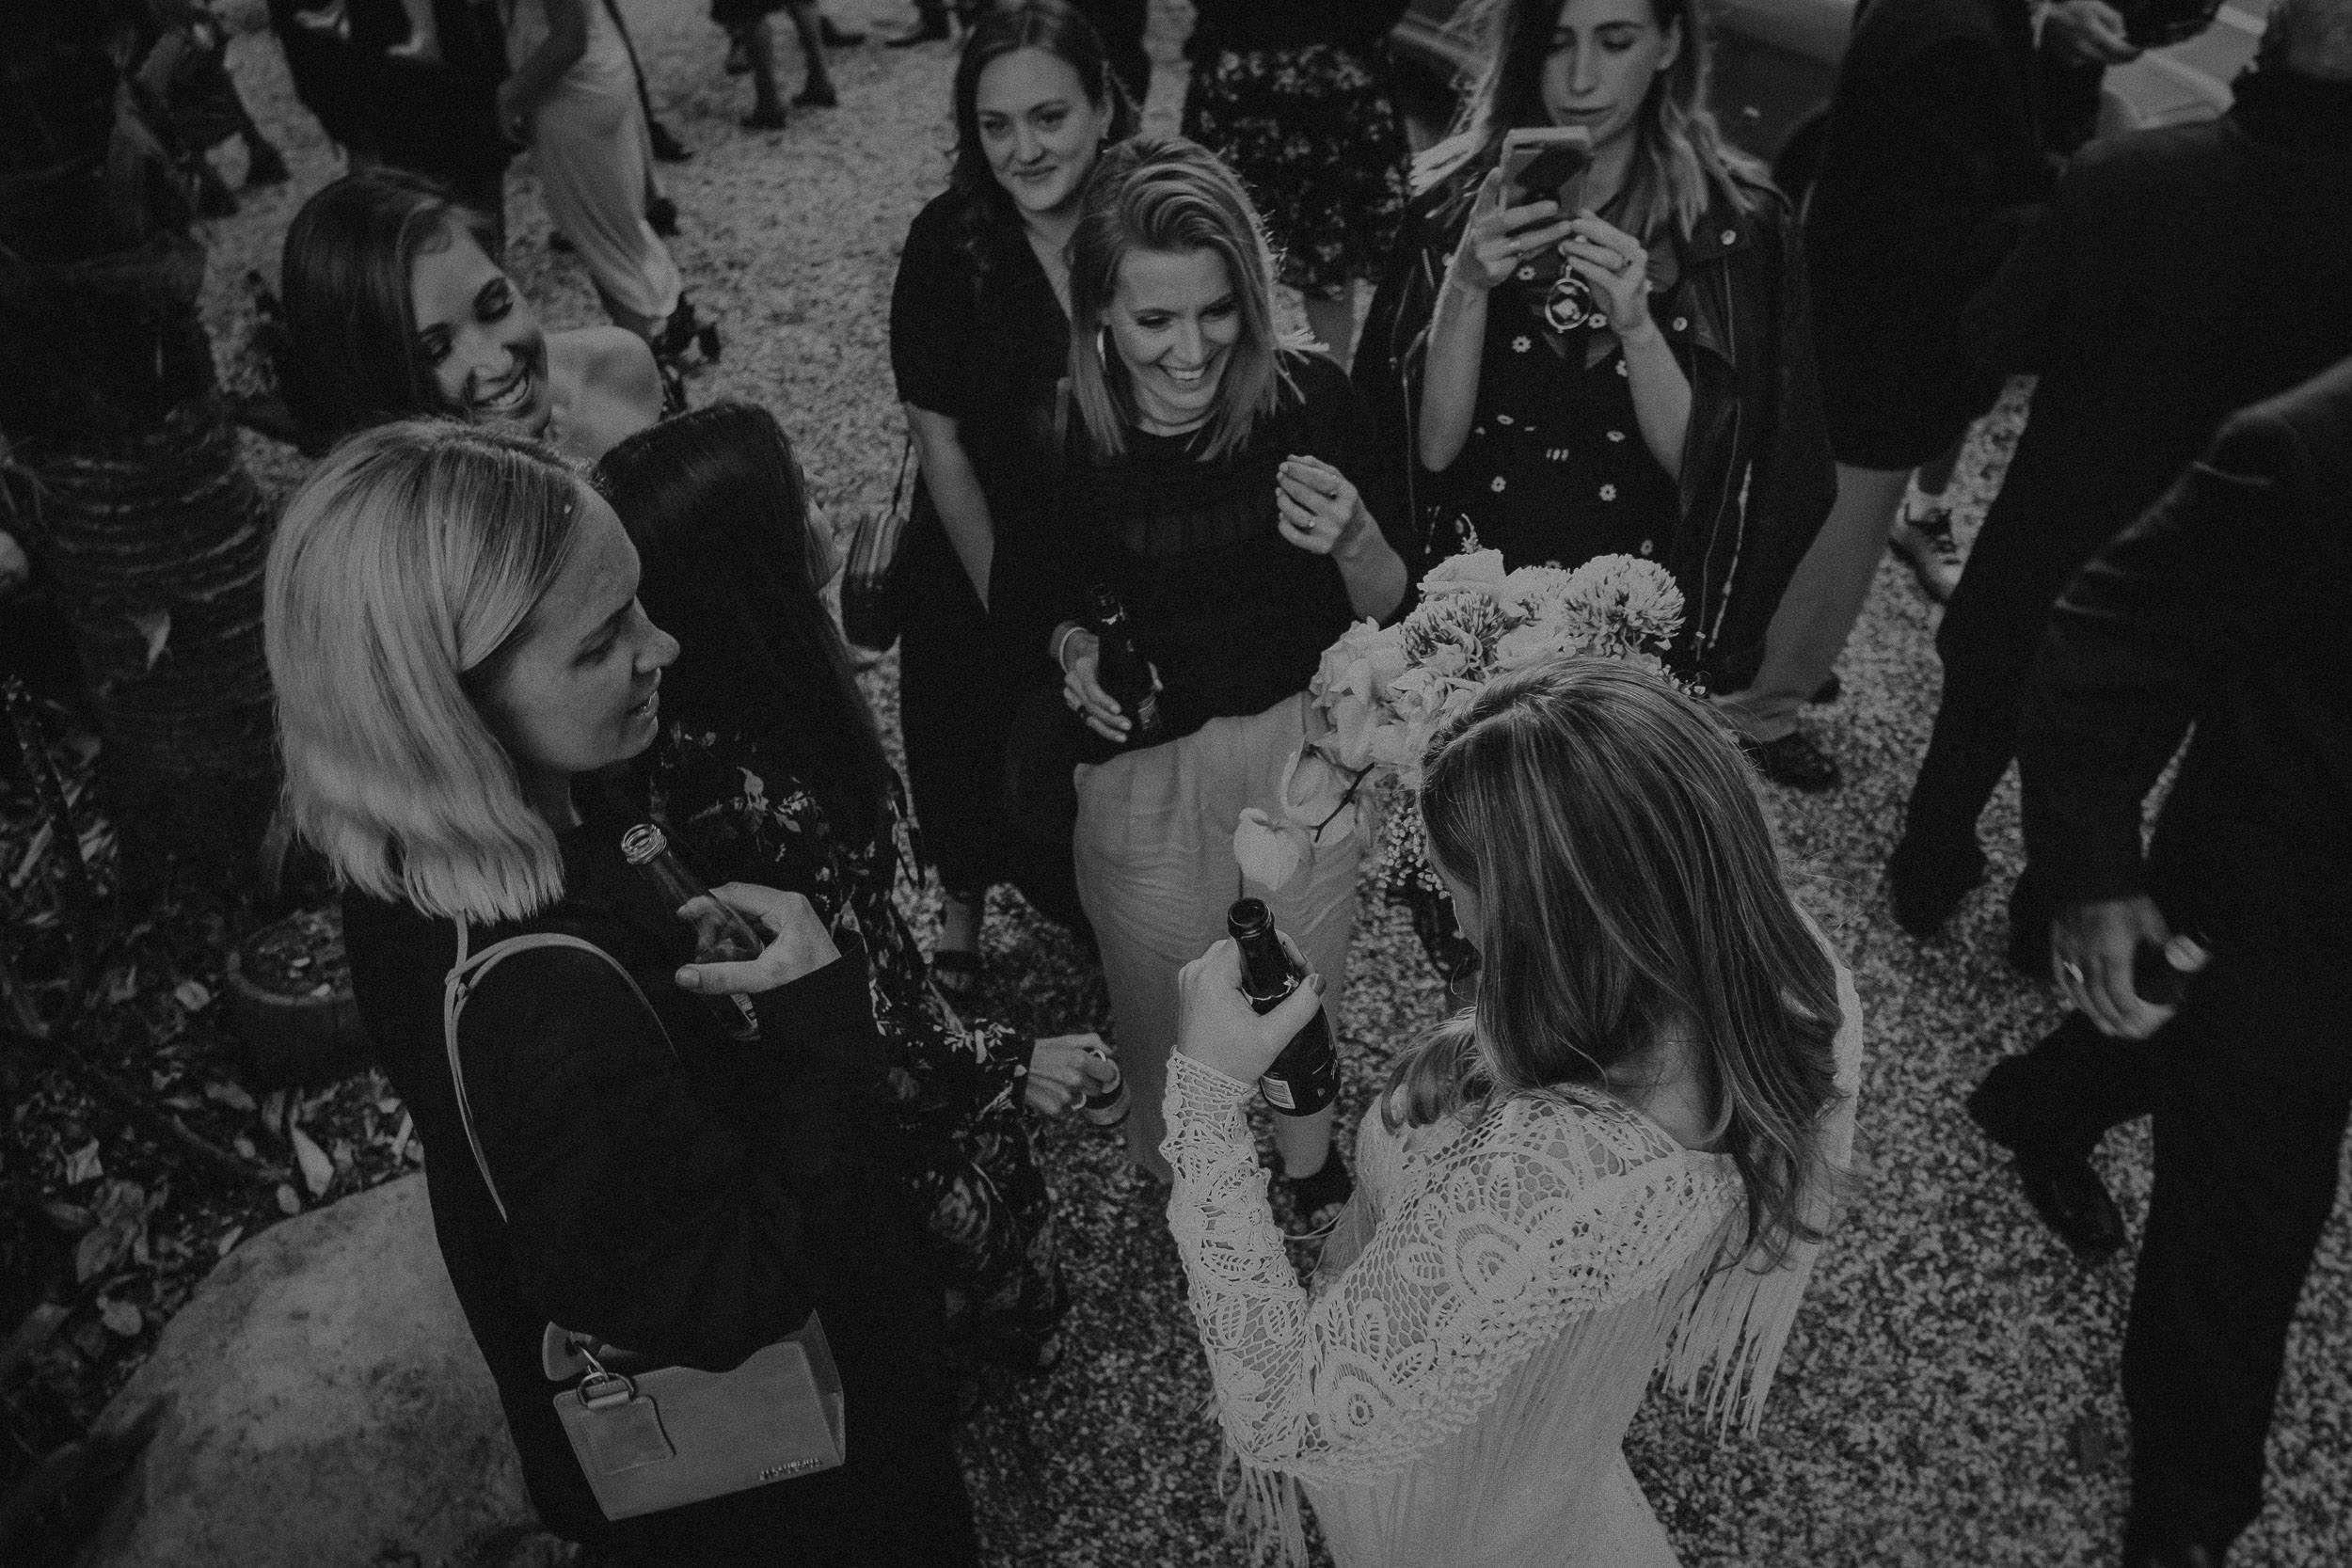 S&A Elopement - Kings & Thieves - Shred 'Til Dead - Central Coast Beach Forest Wedding - 340.jpg